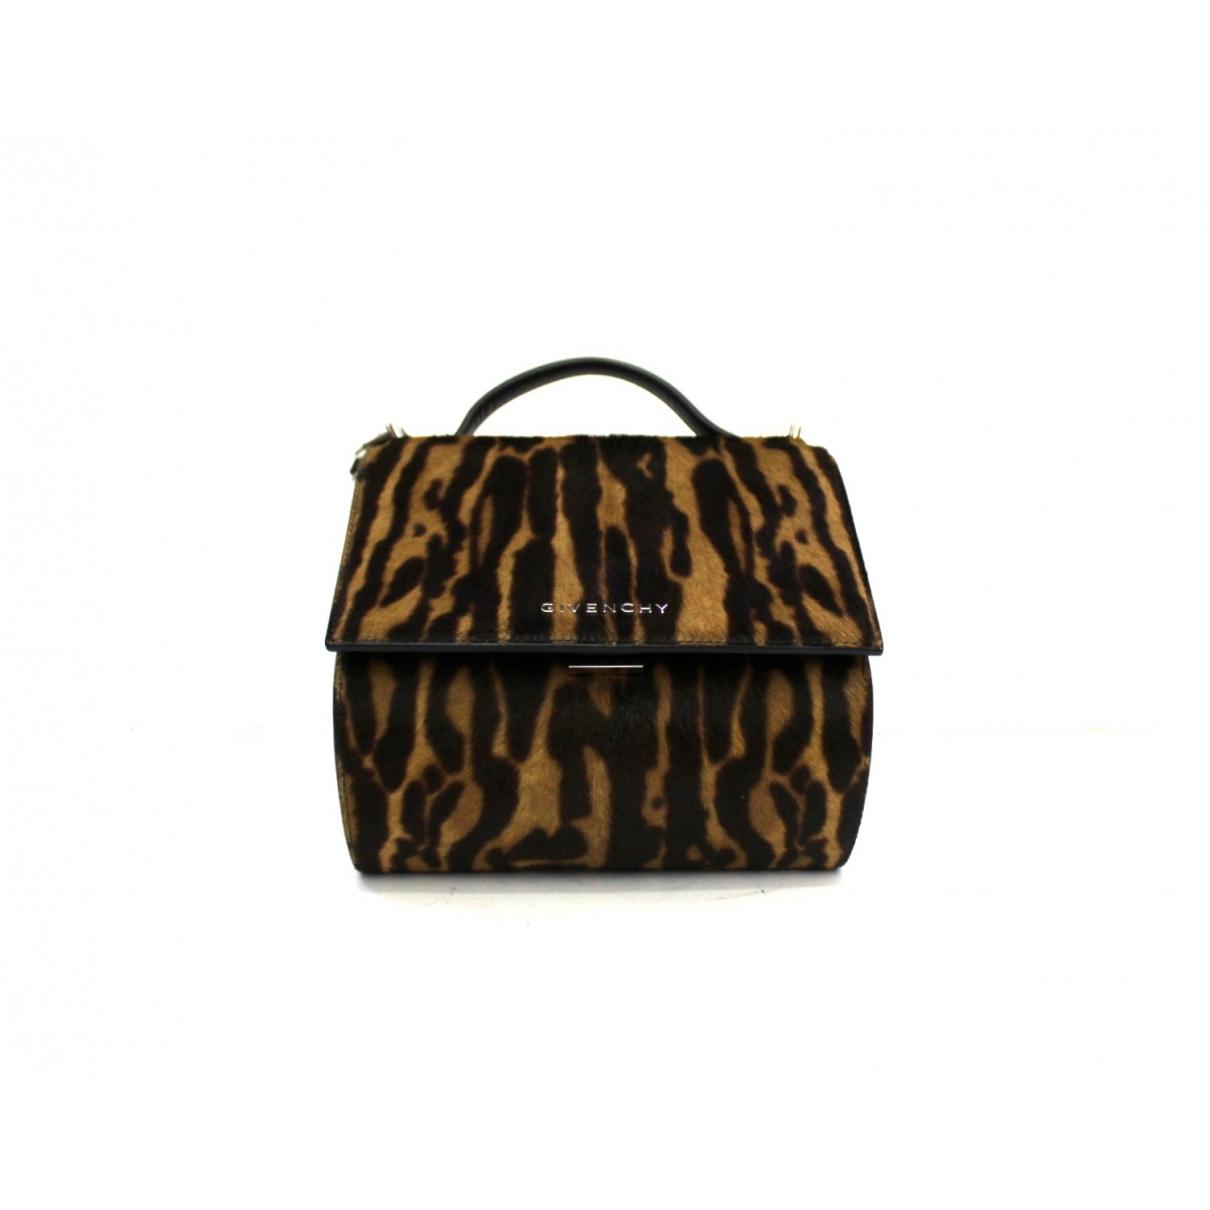 Givenchy Pandora Box Pony-style calfskin handbag for Women \N